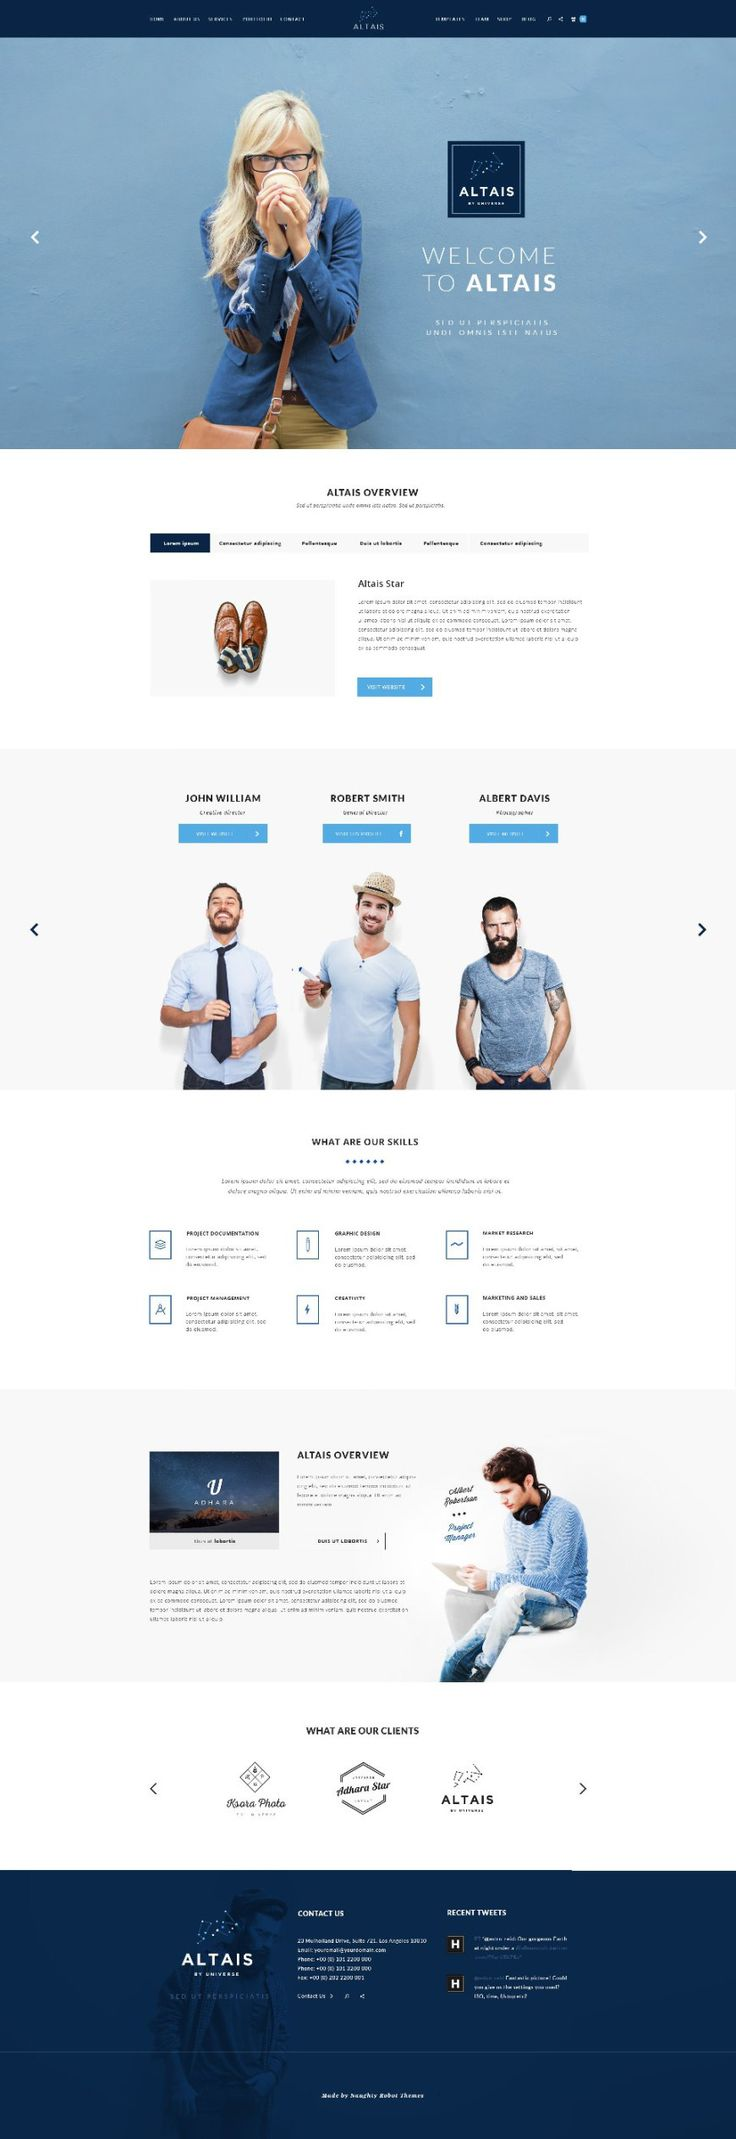 Best Web Design Images On Pinterest Web Design Inspiration - Web development company website template